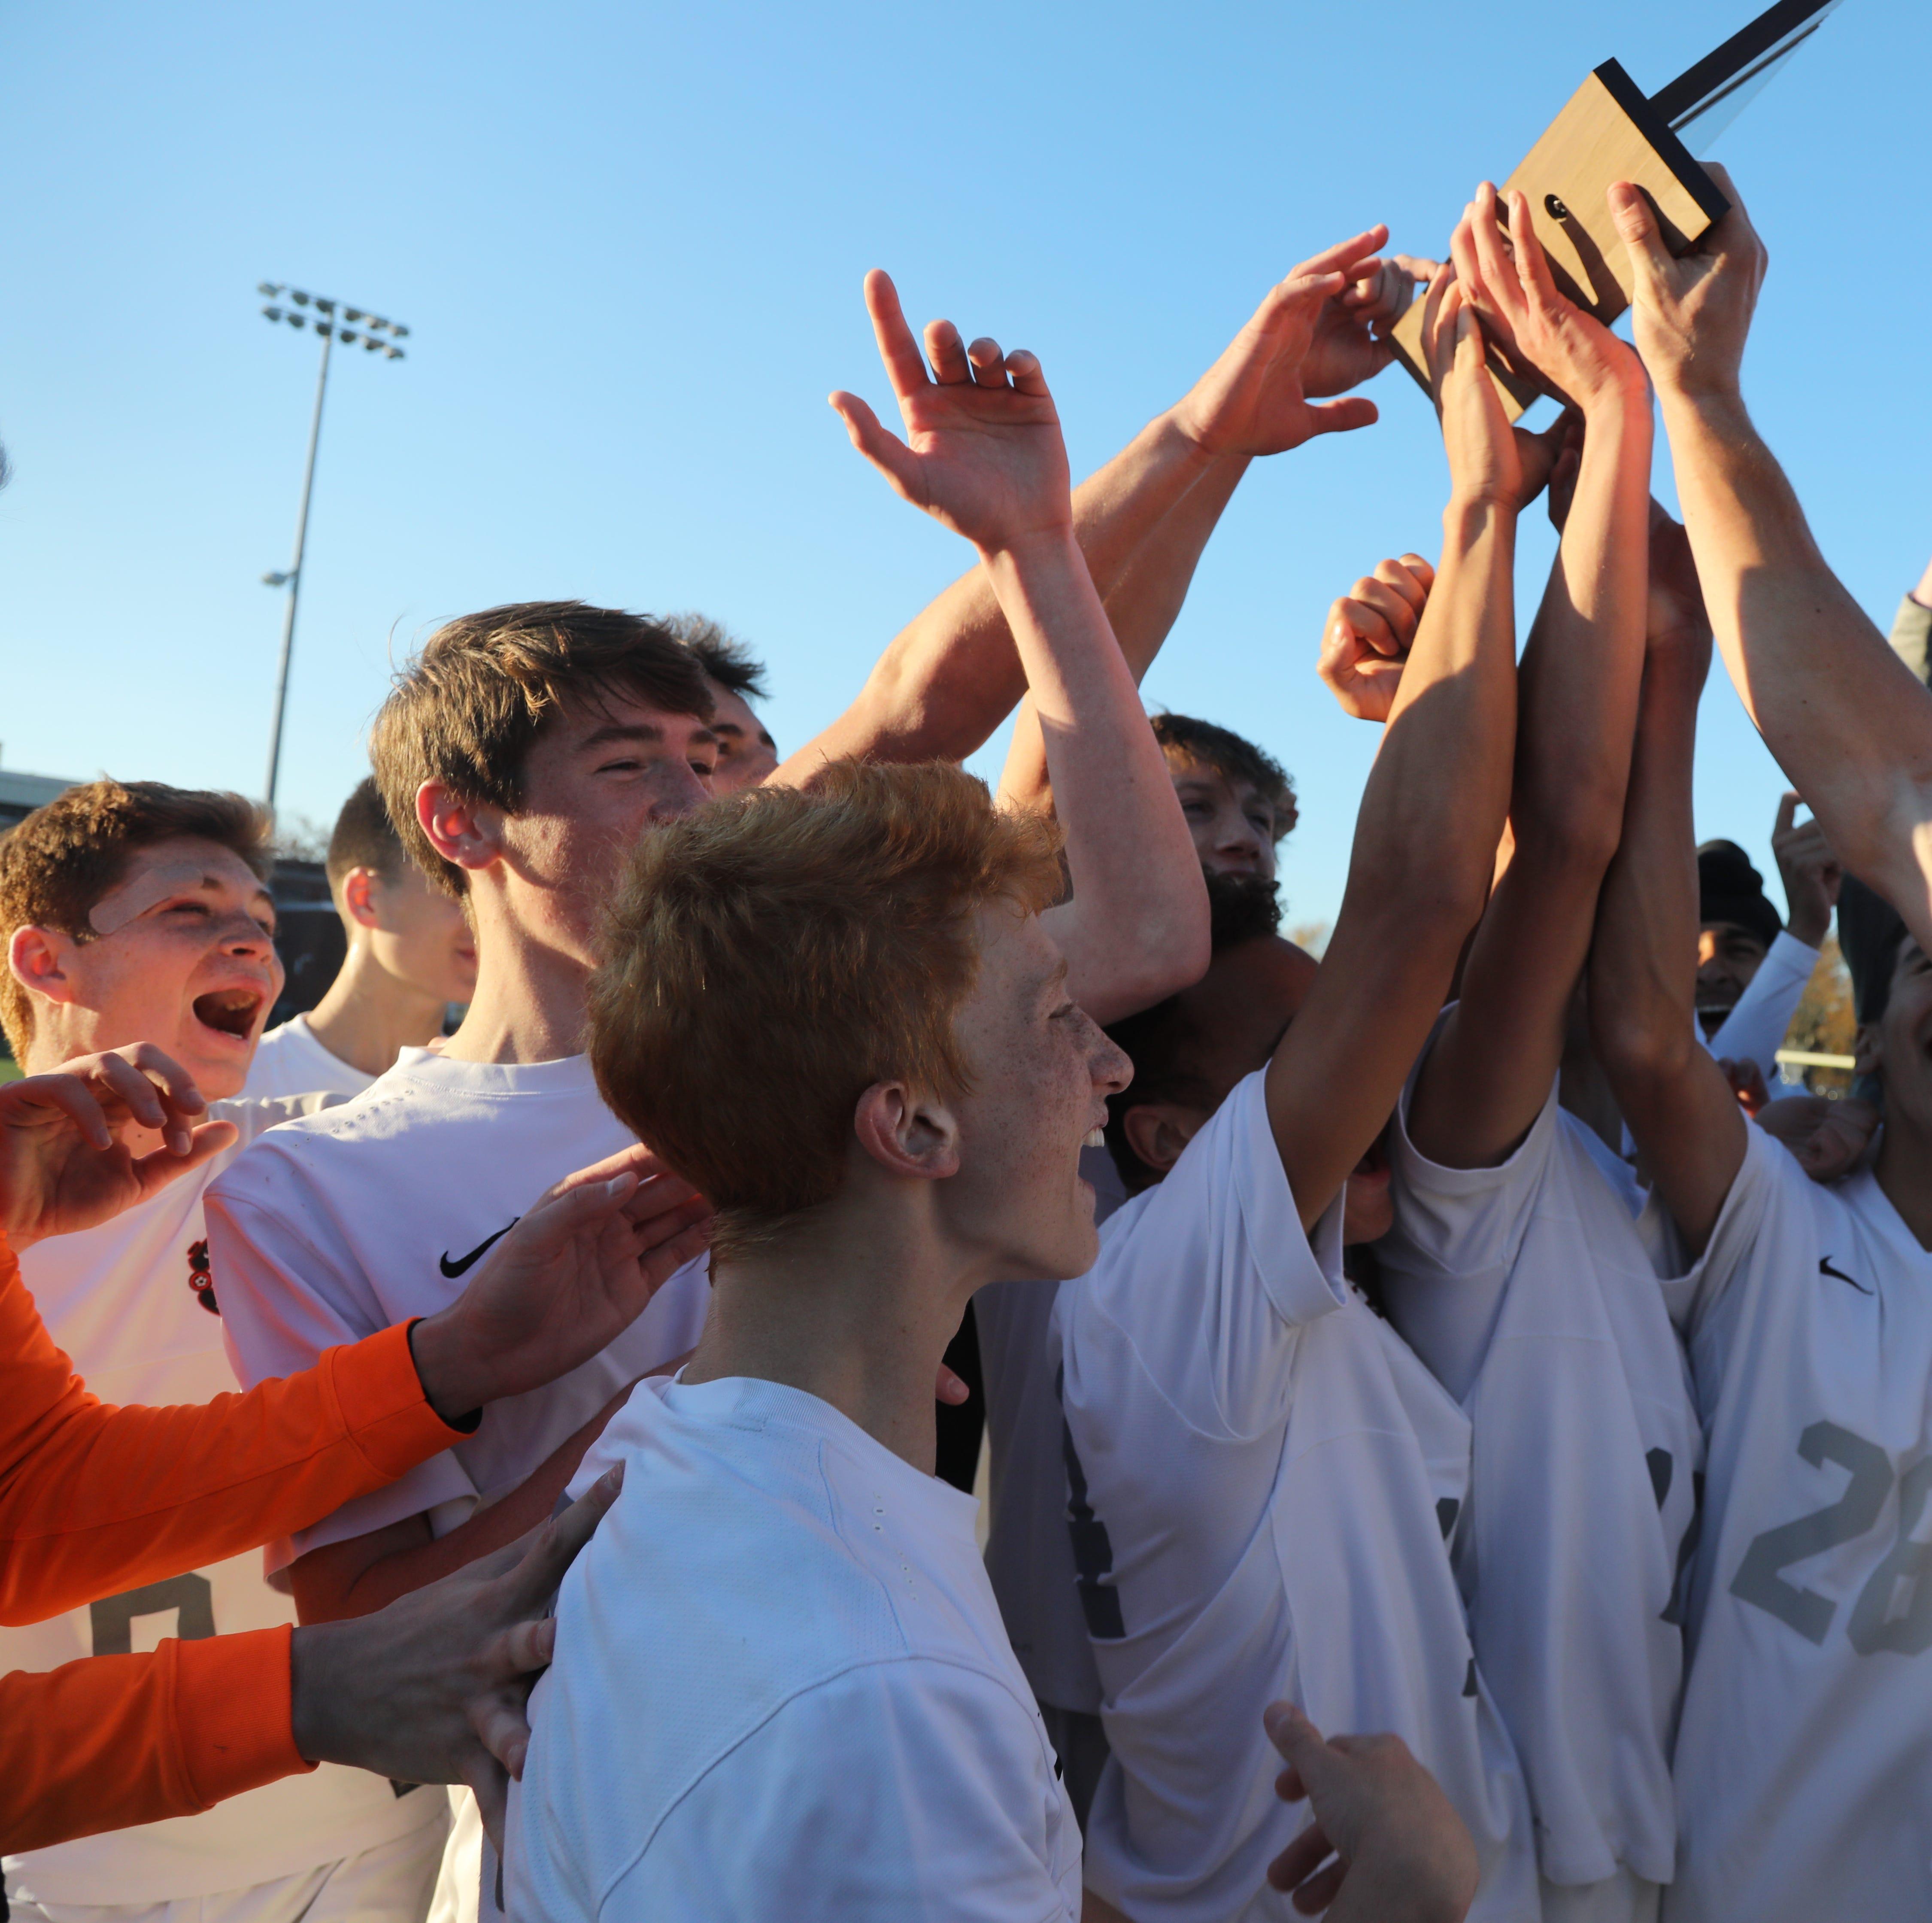 Glen Rock boys soccer has a chance to go down as one of Bergen's best